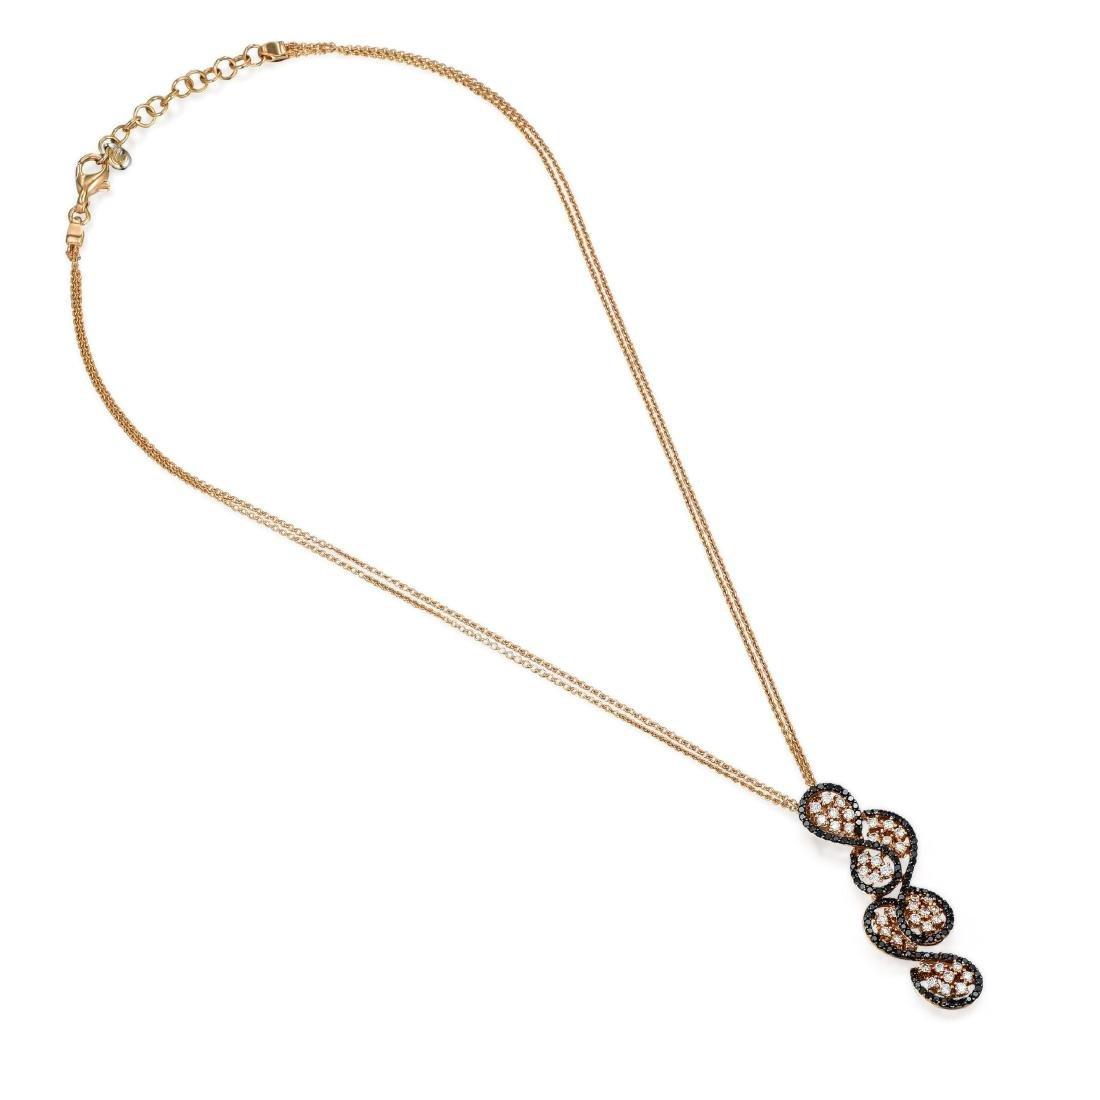 18K Gold Diamond Pendant Necklace - 2